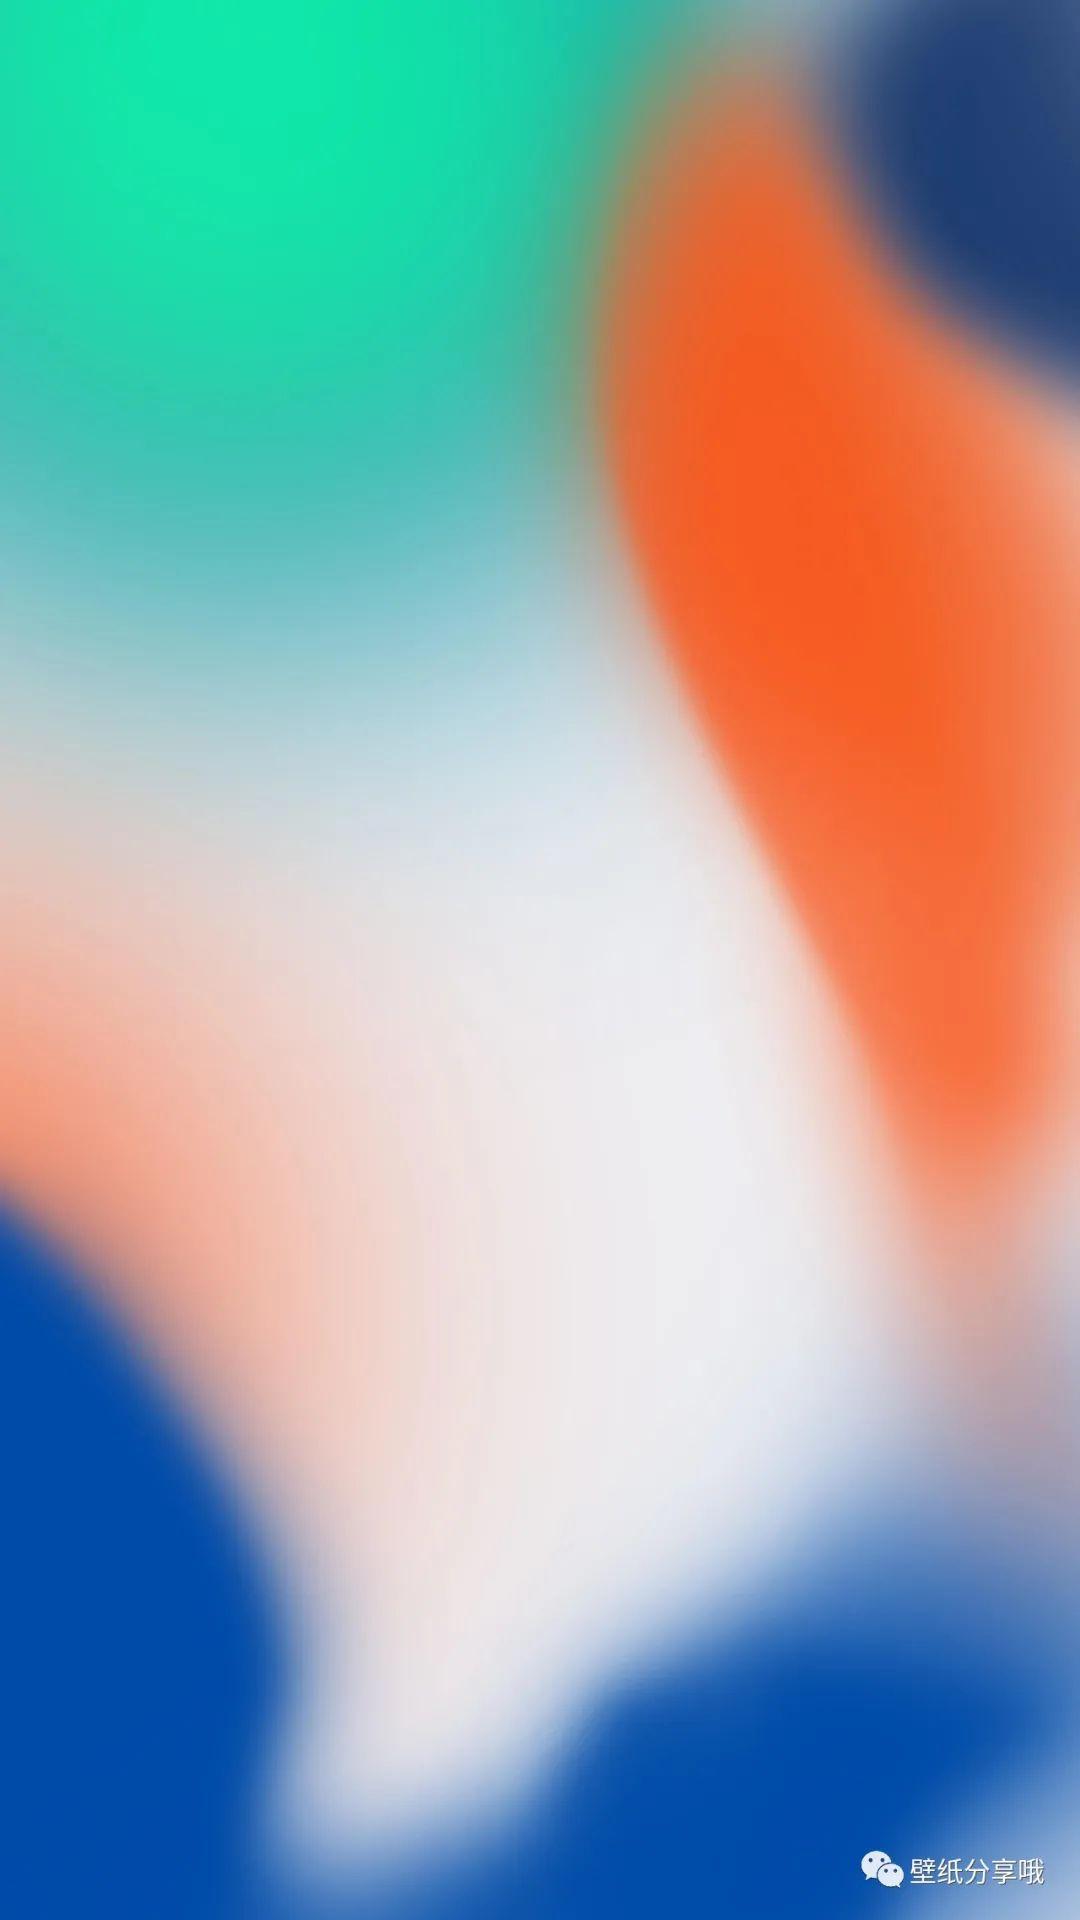 iphonex壁纸尺寸(适合苹果x的壁纸尺寸)